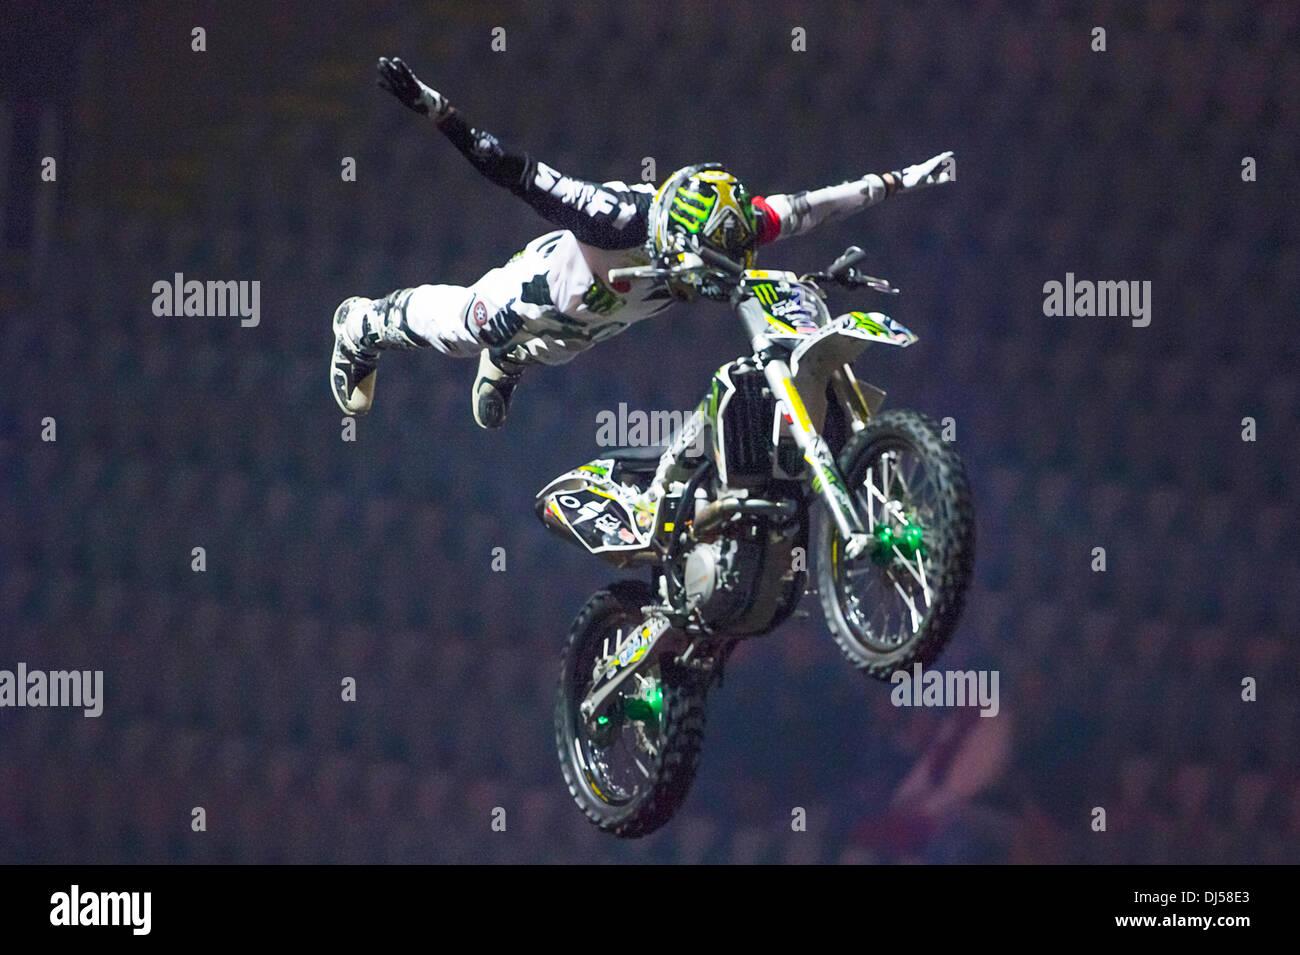 Oslo, Norway. 21st November 2013. Blake Bilko Williams does a super man freestyle motocross trick during the Nitro - Stock Image